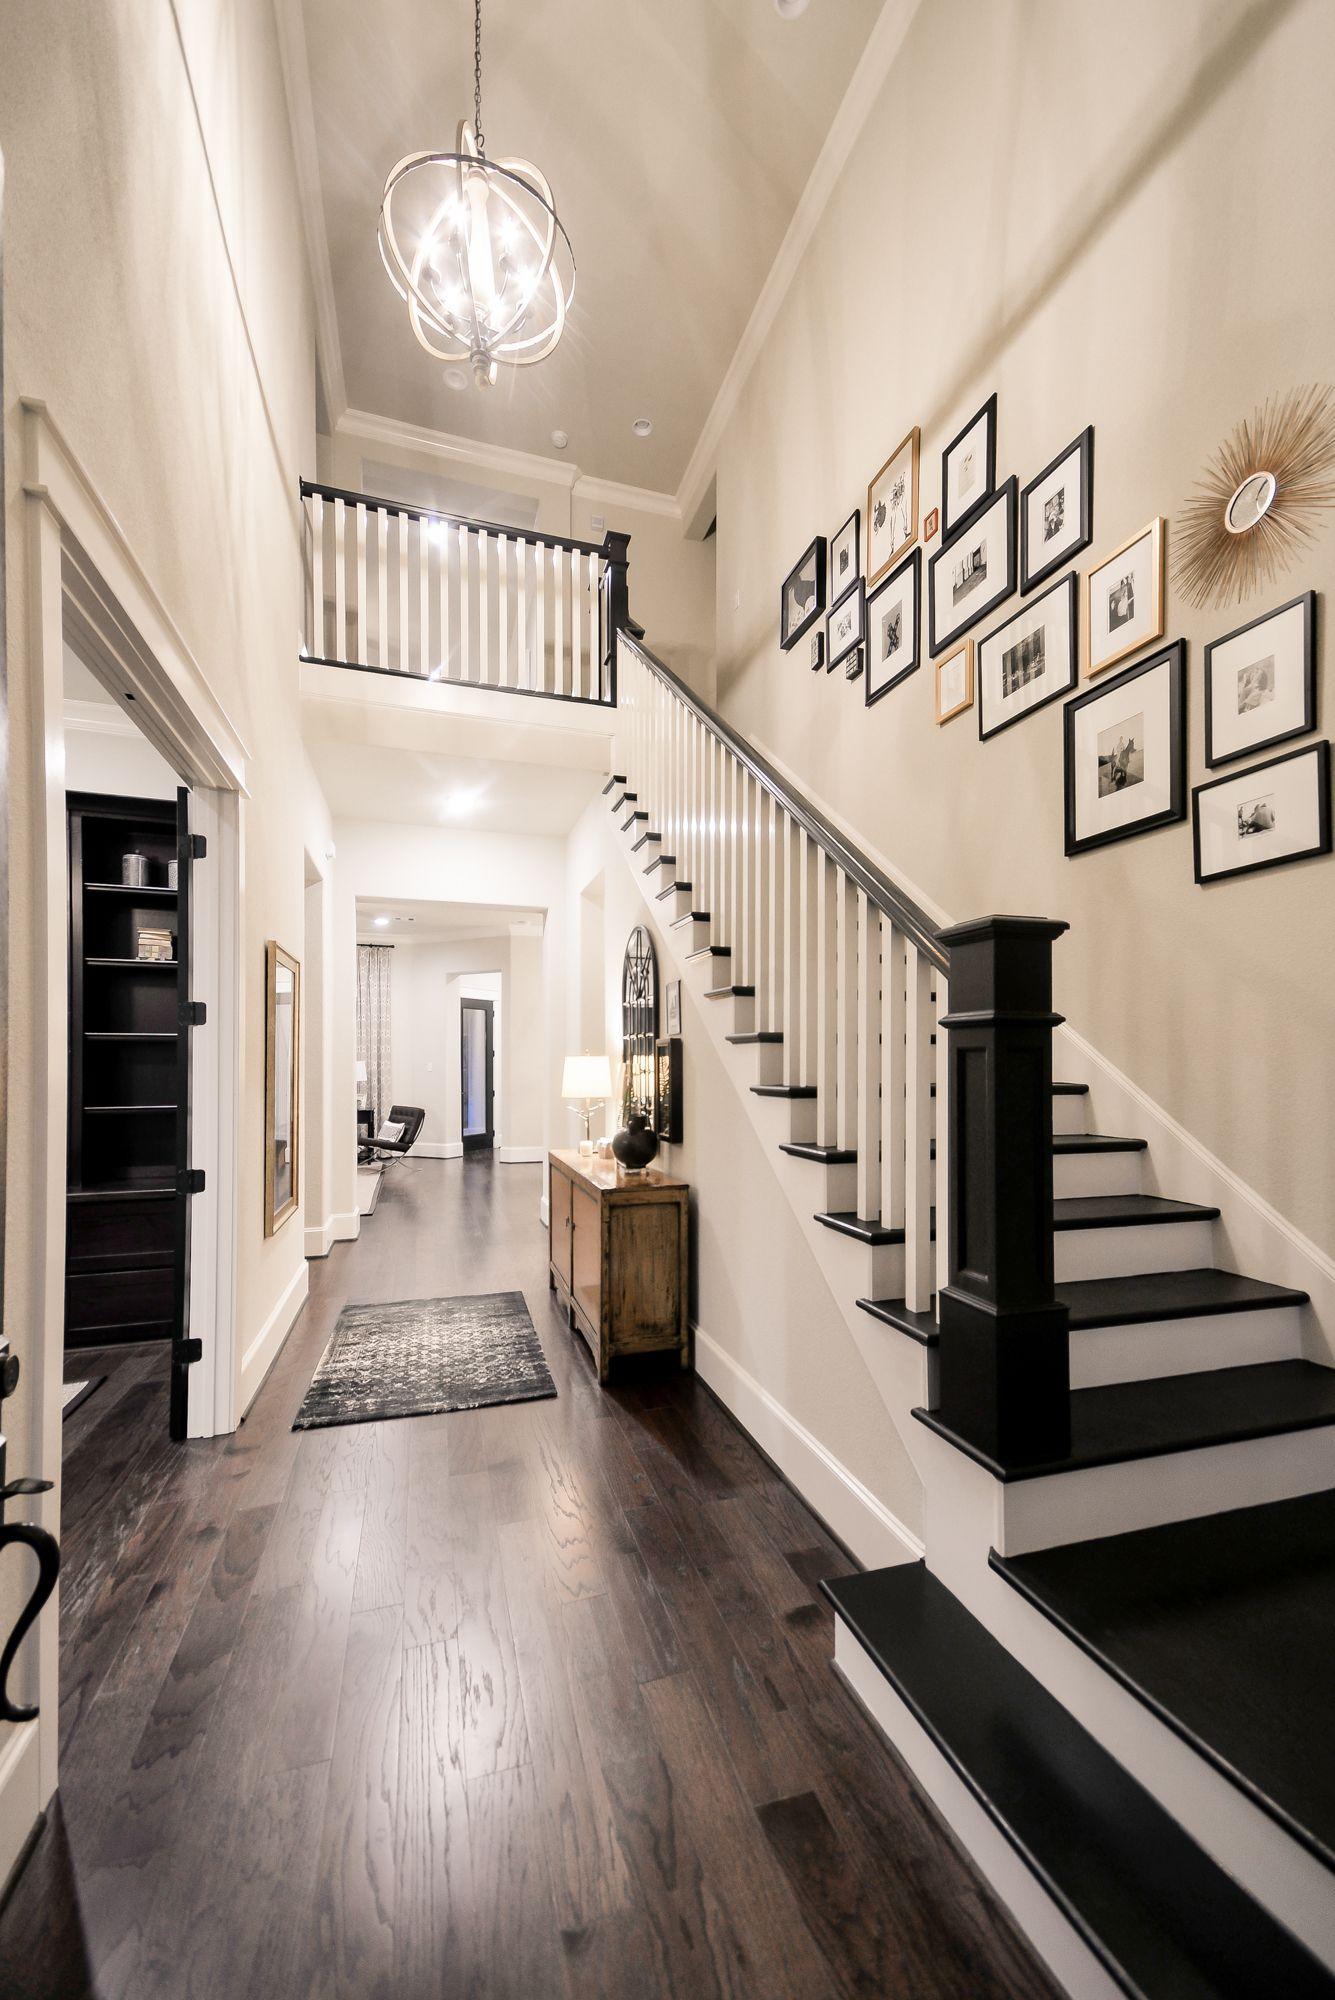 Escalier Interieur Maison Moderne gallery | escaliers maison, déco entrée maison, entrée maison